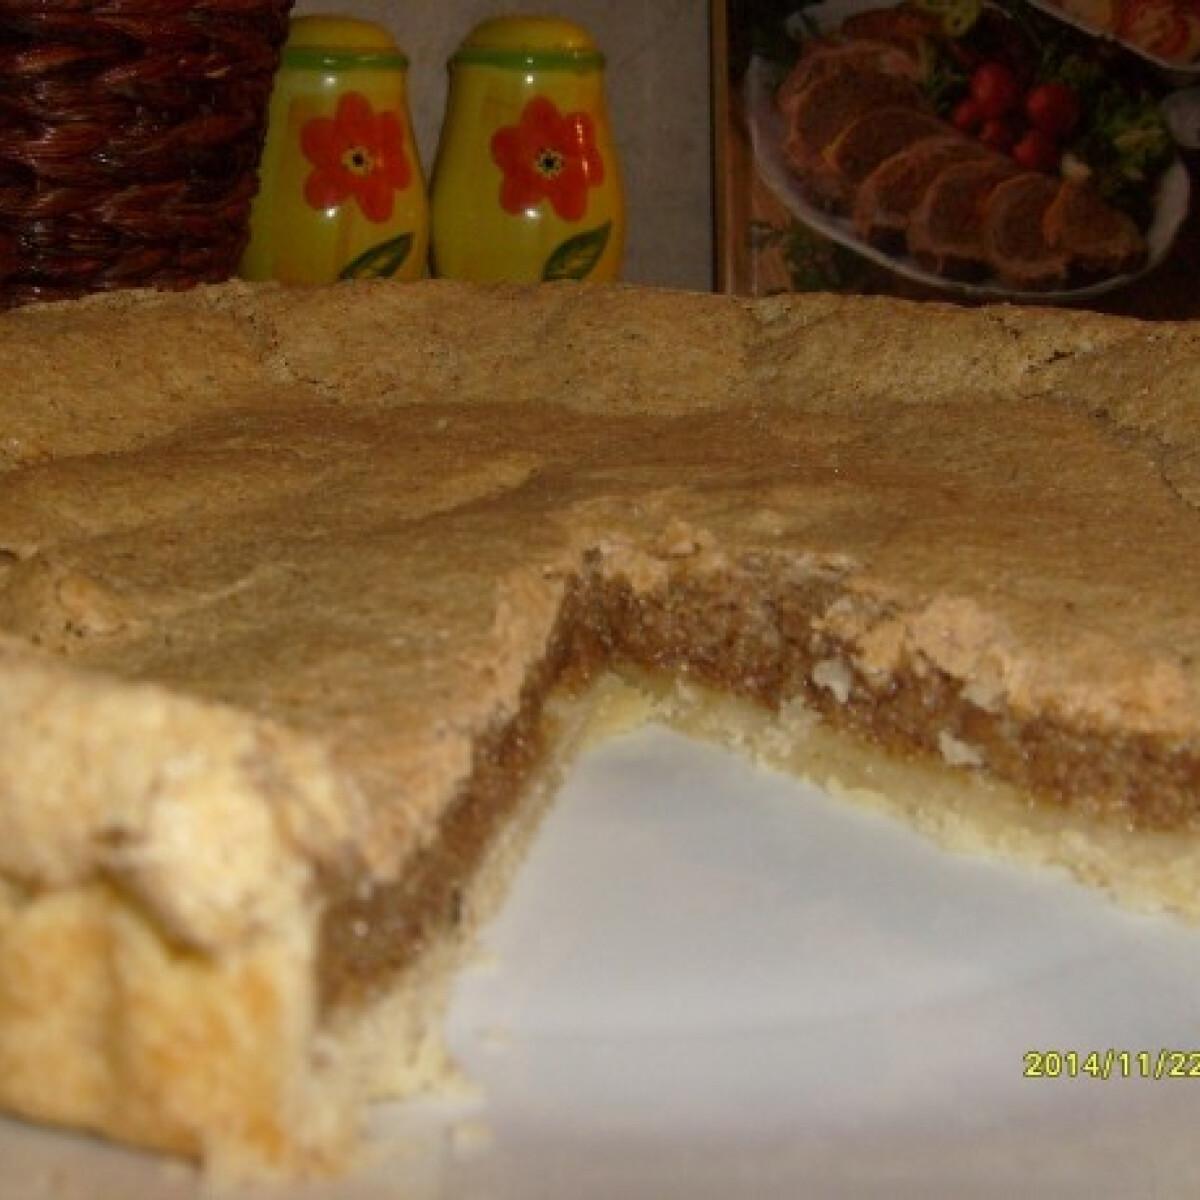 Ezen a képen: Dióhabos pite